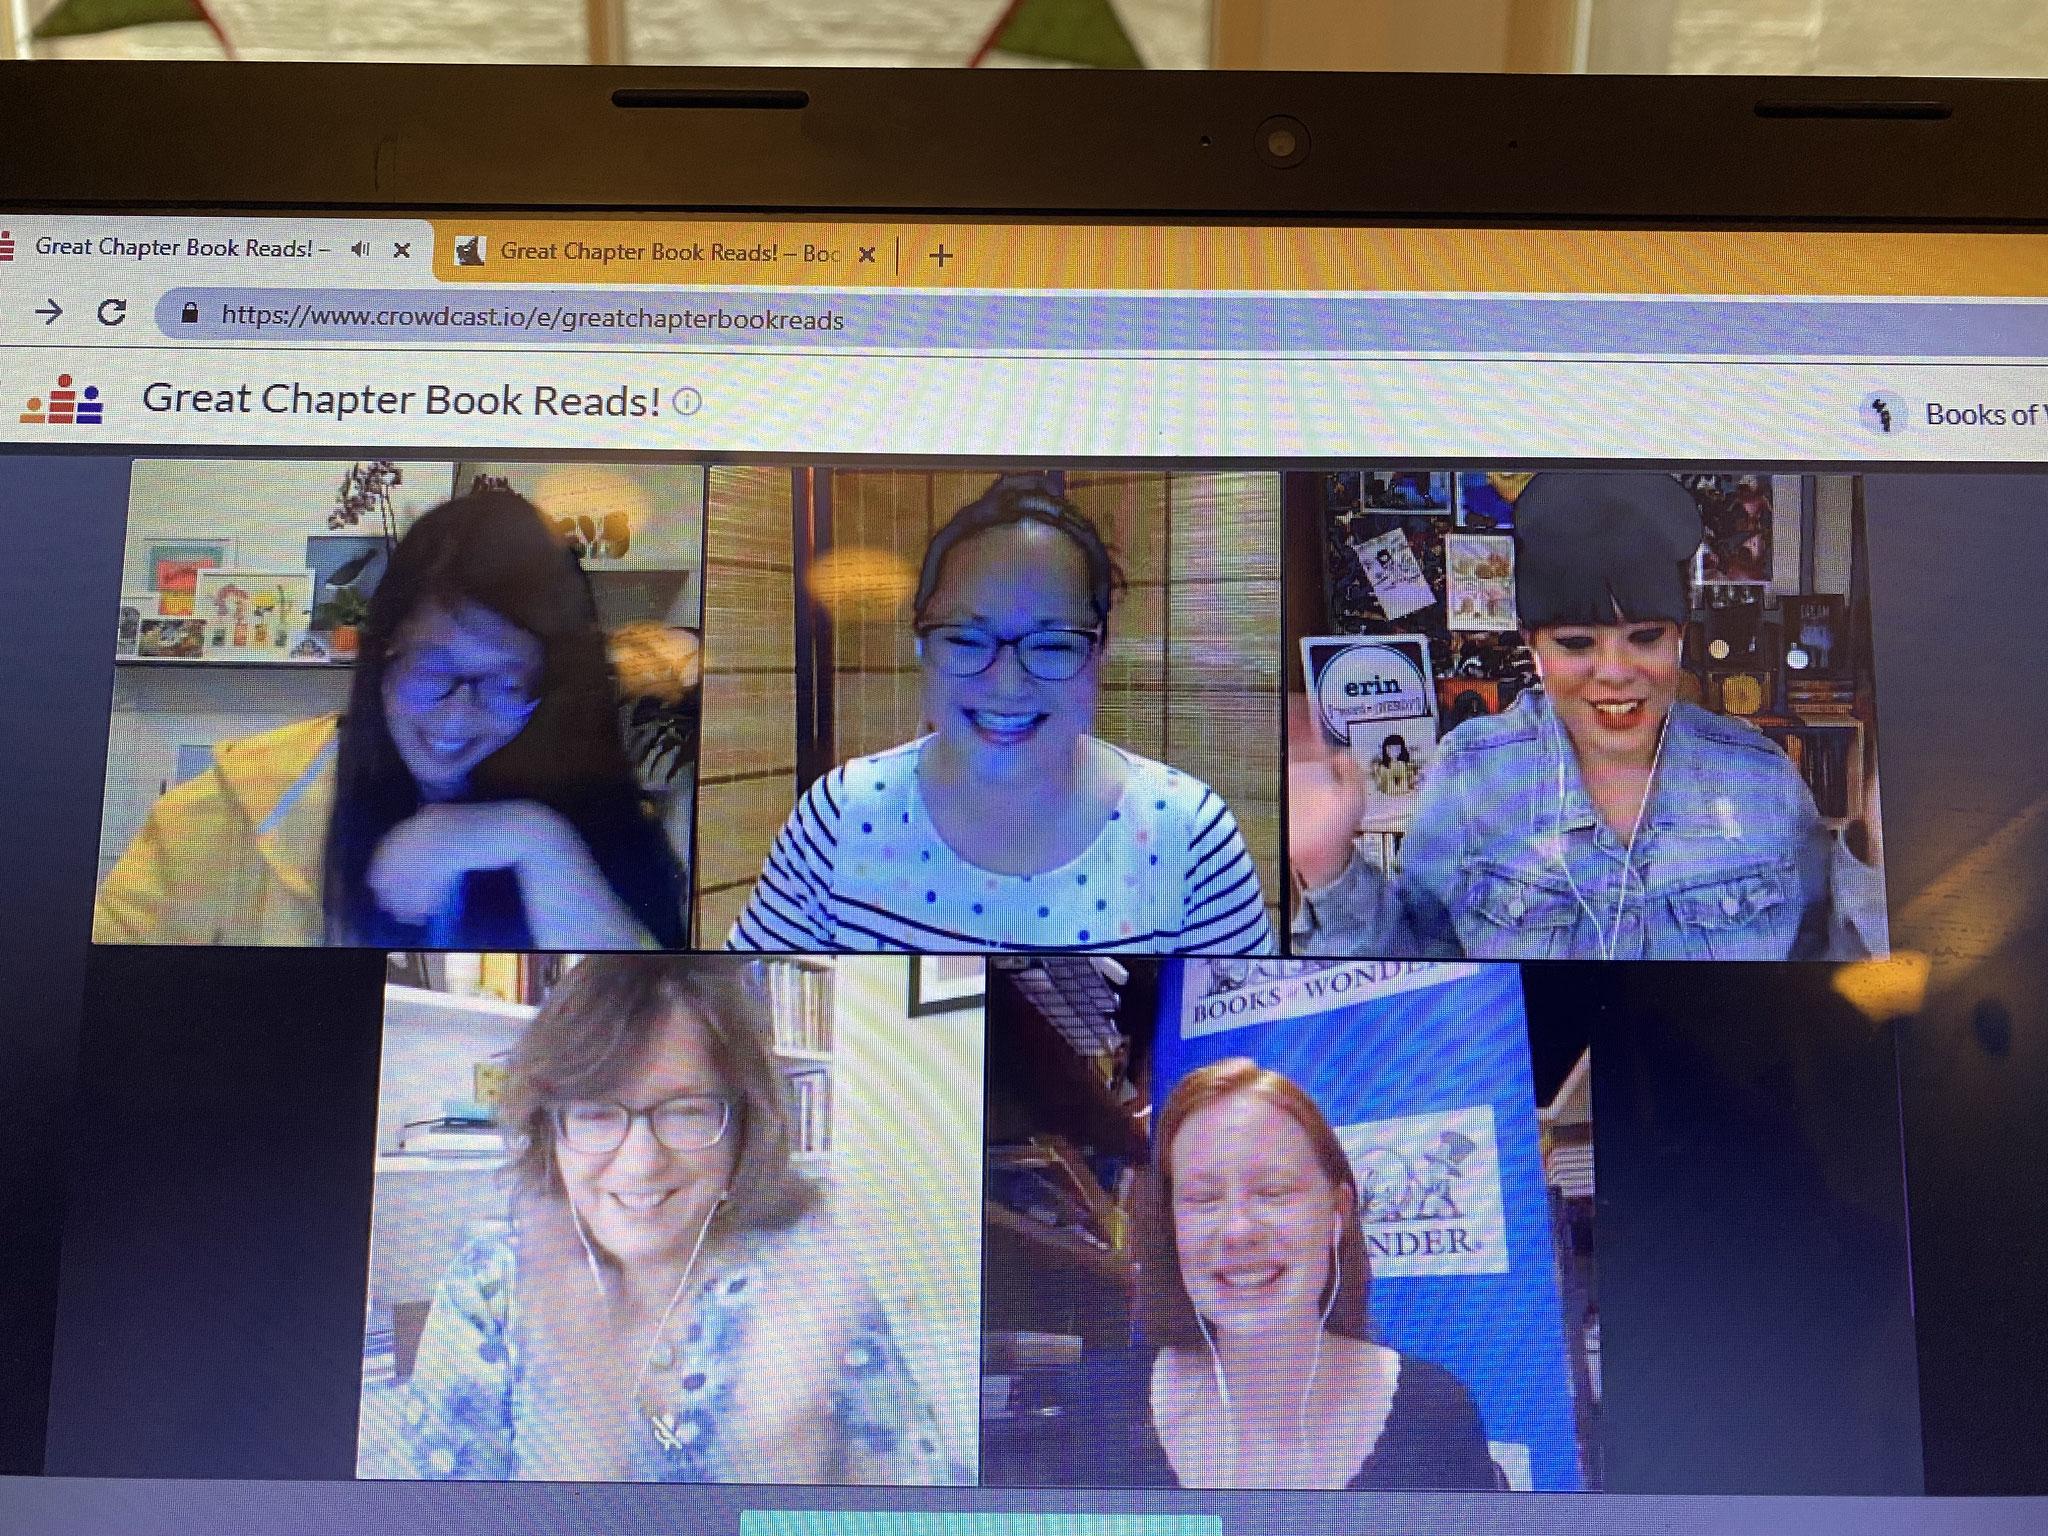 Great Chapter Books Reads Sept 2021 - Erin Entrada Kelly, Carolyn Crimi, Kate Klise and Natelle Quek (Books of Wonder Event)